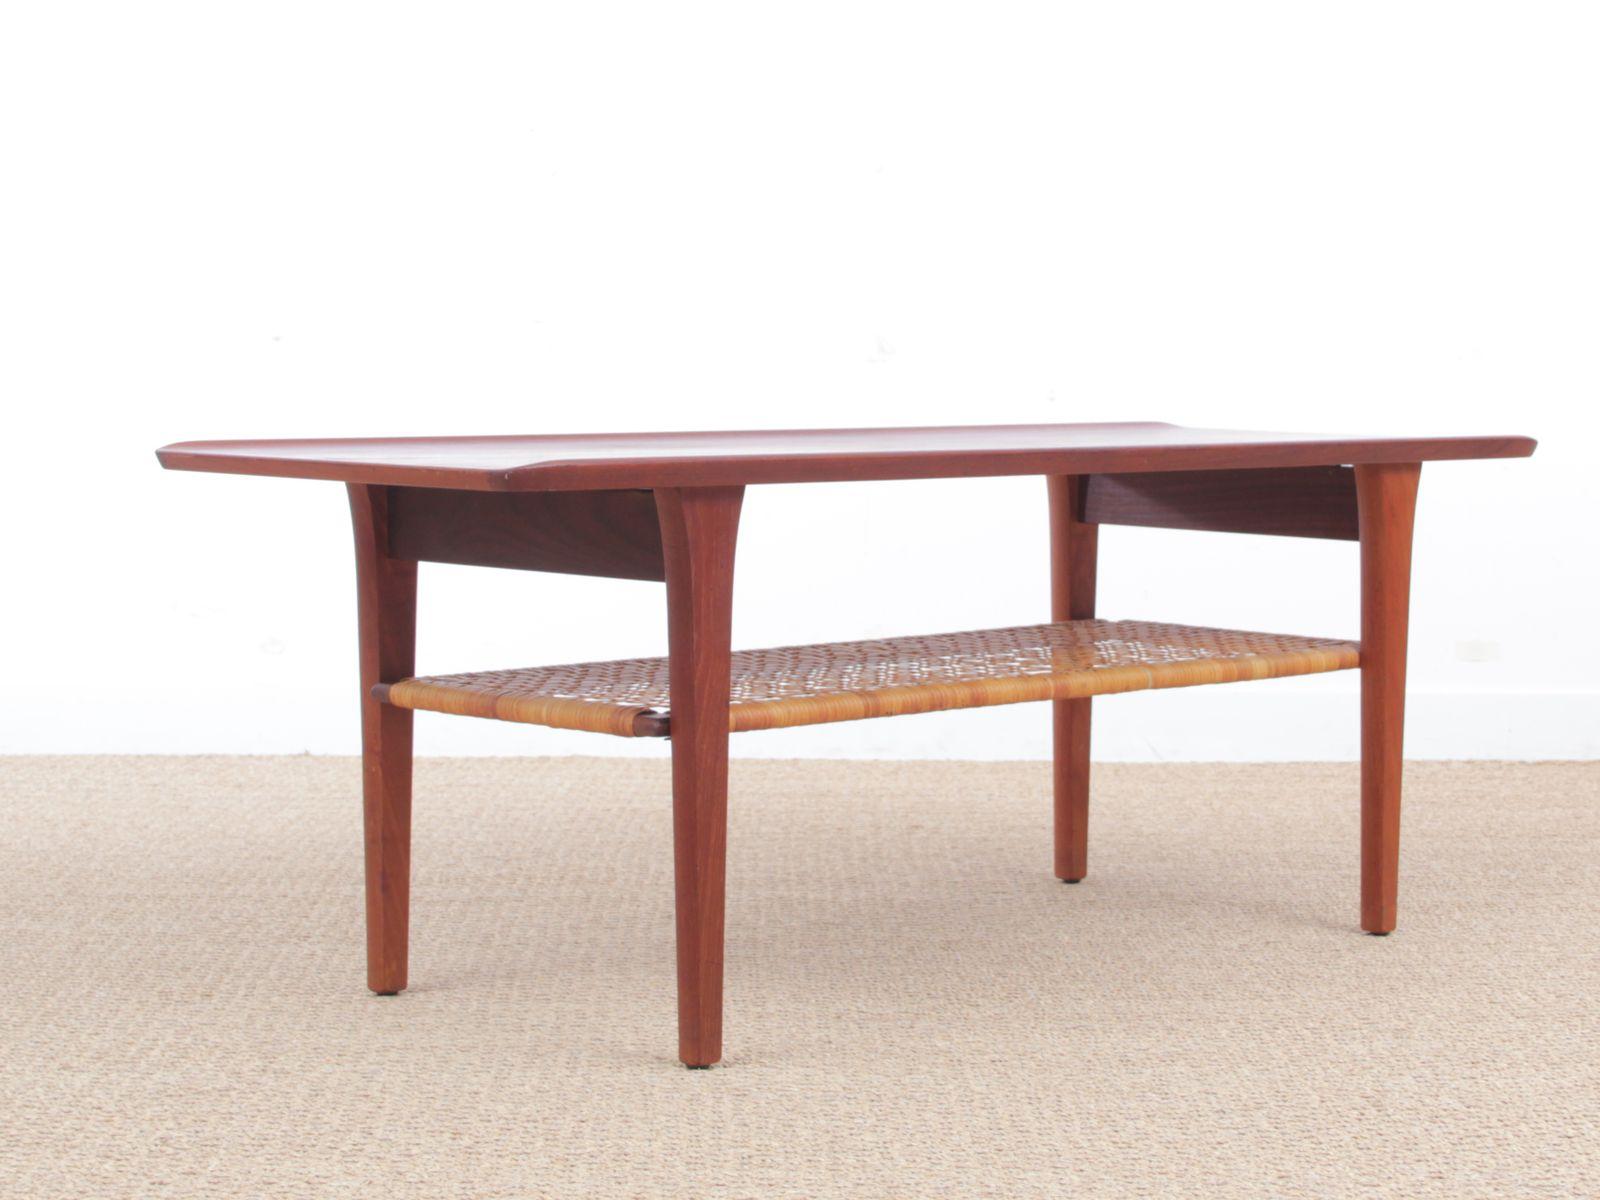 Mid Century Modern Scandinavian Coffee Table in Teak 1960s for